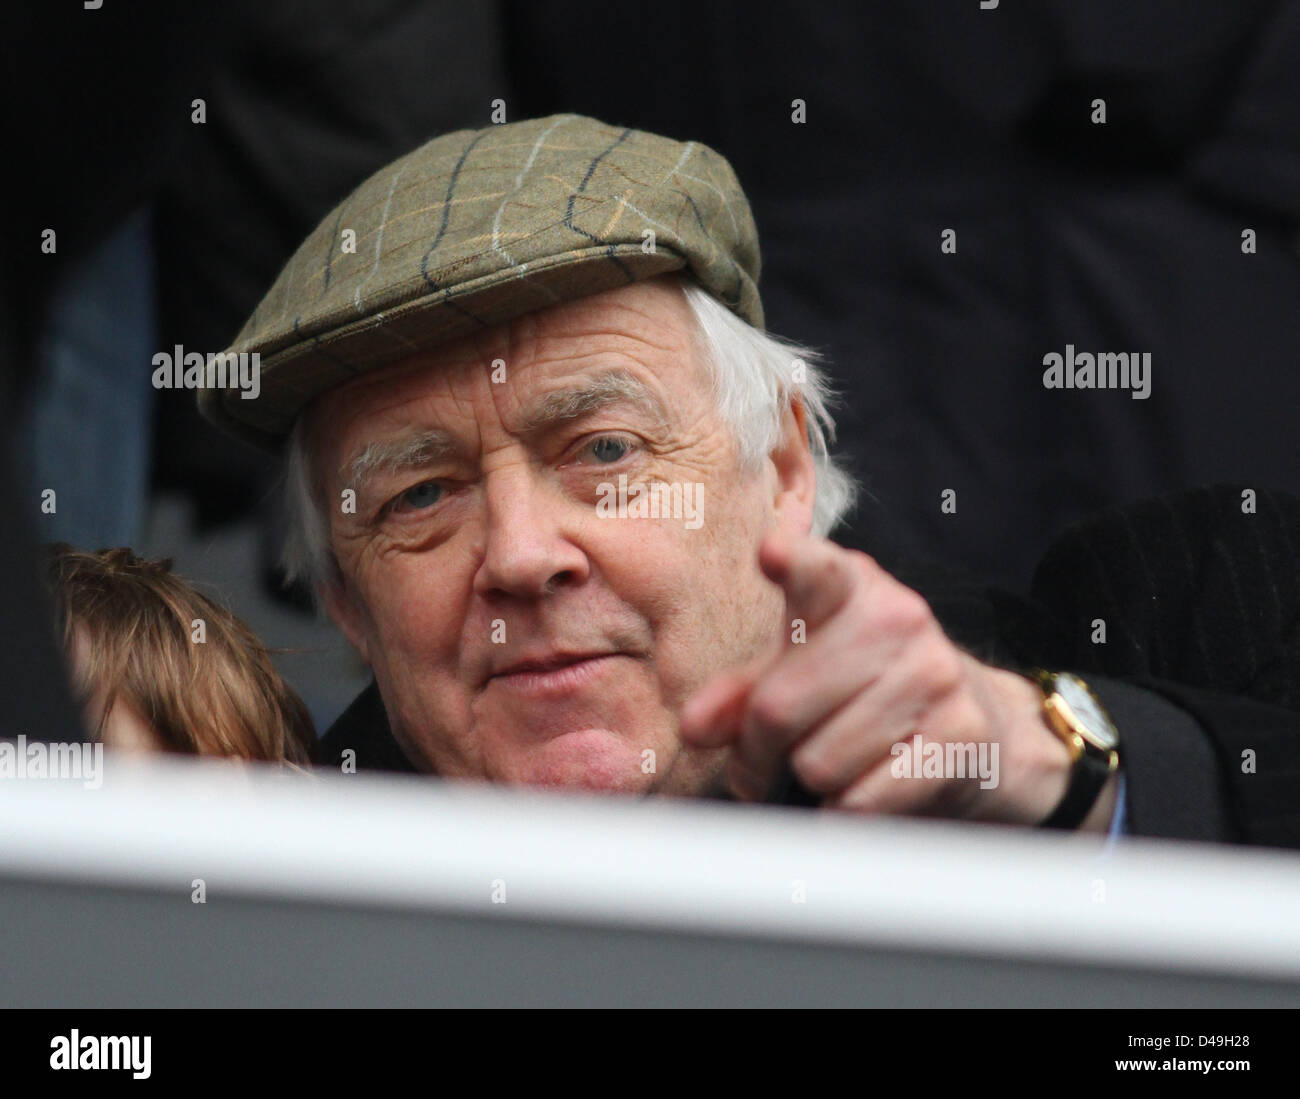 TIM RICE WATCHES FOOTBALL GAME QUEENS PARK RANGERS V SUNDERLAND. BARCLAYS PREMIER LEAGUE LOFTUS ROAD LONDON ENGLAND - Stock Image